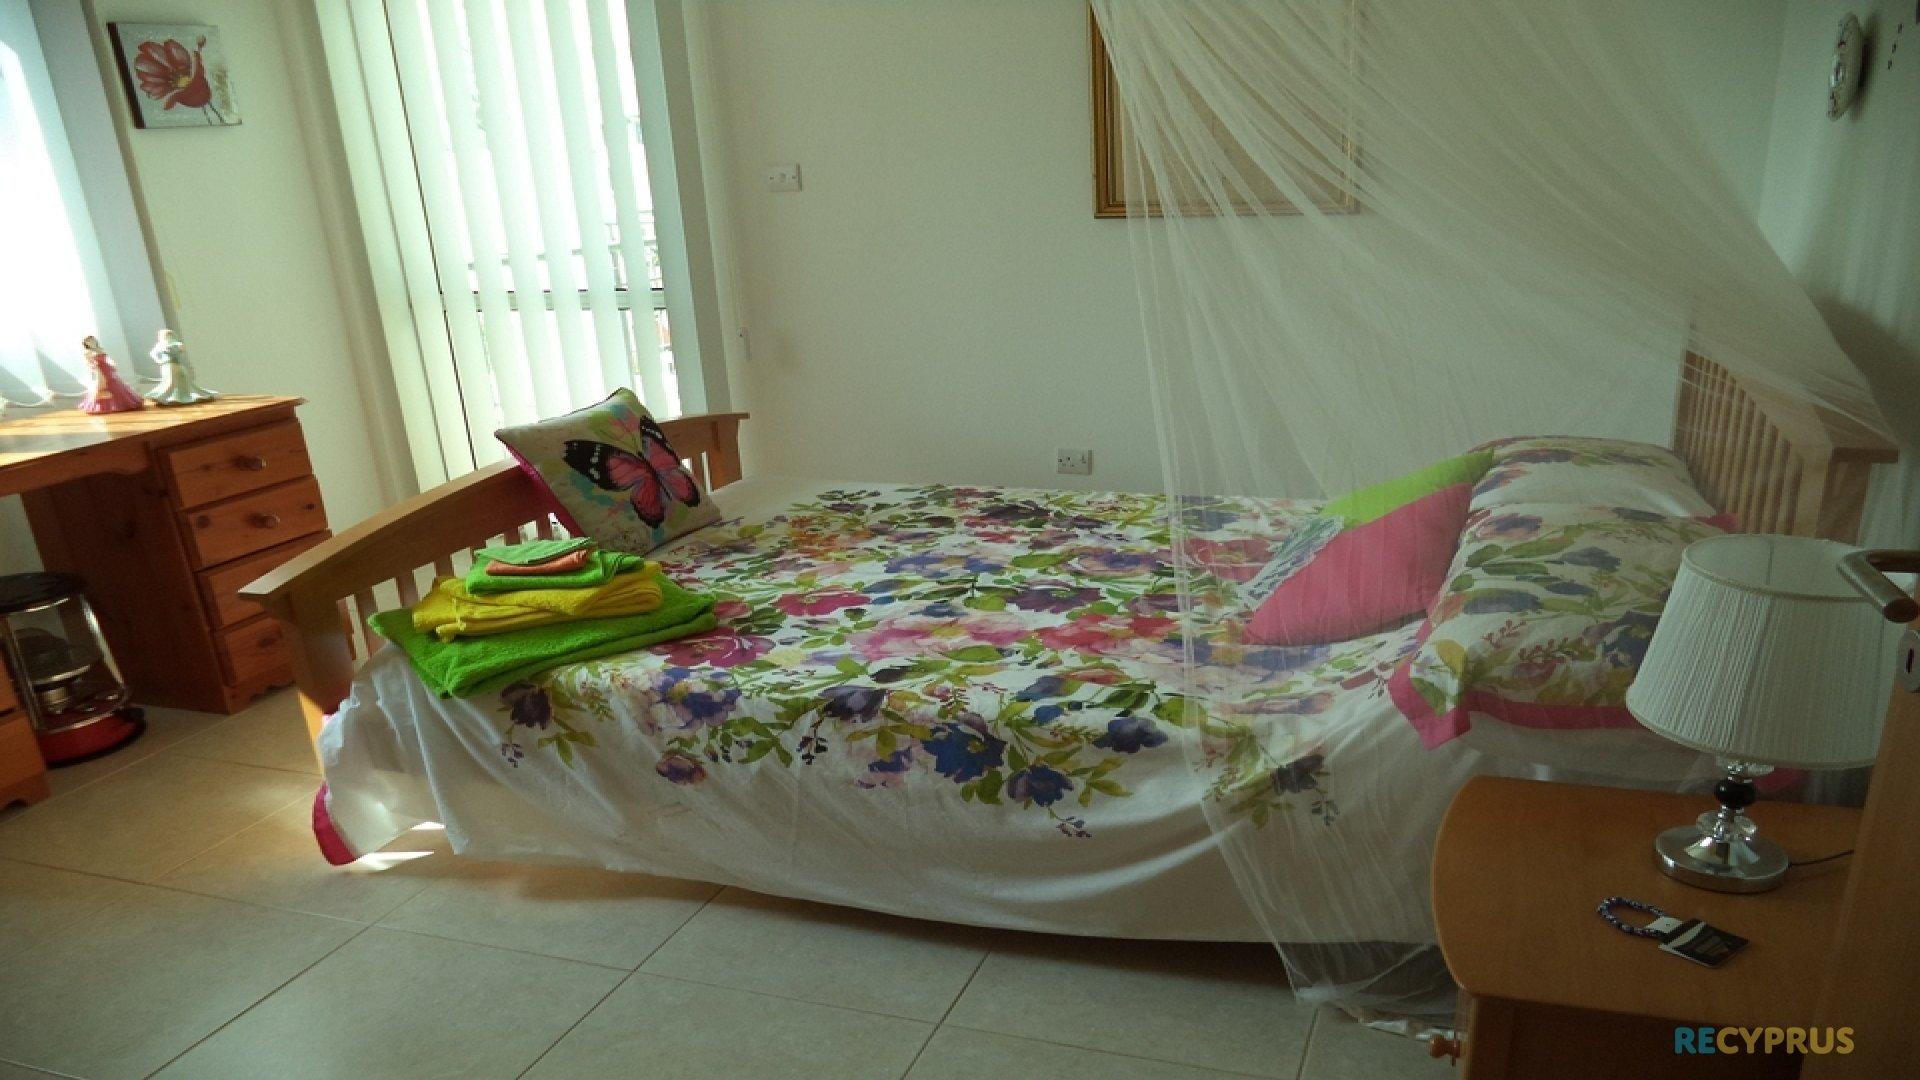 Apartment for sale Kapparis Famagusta Cyprus 8 3463